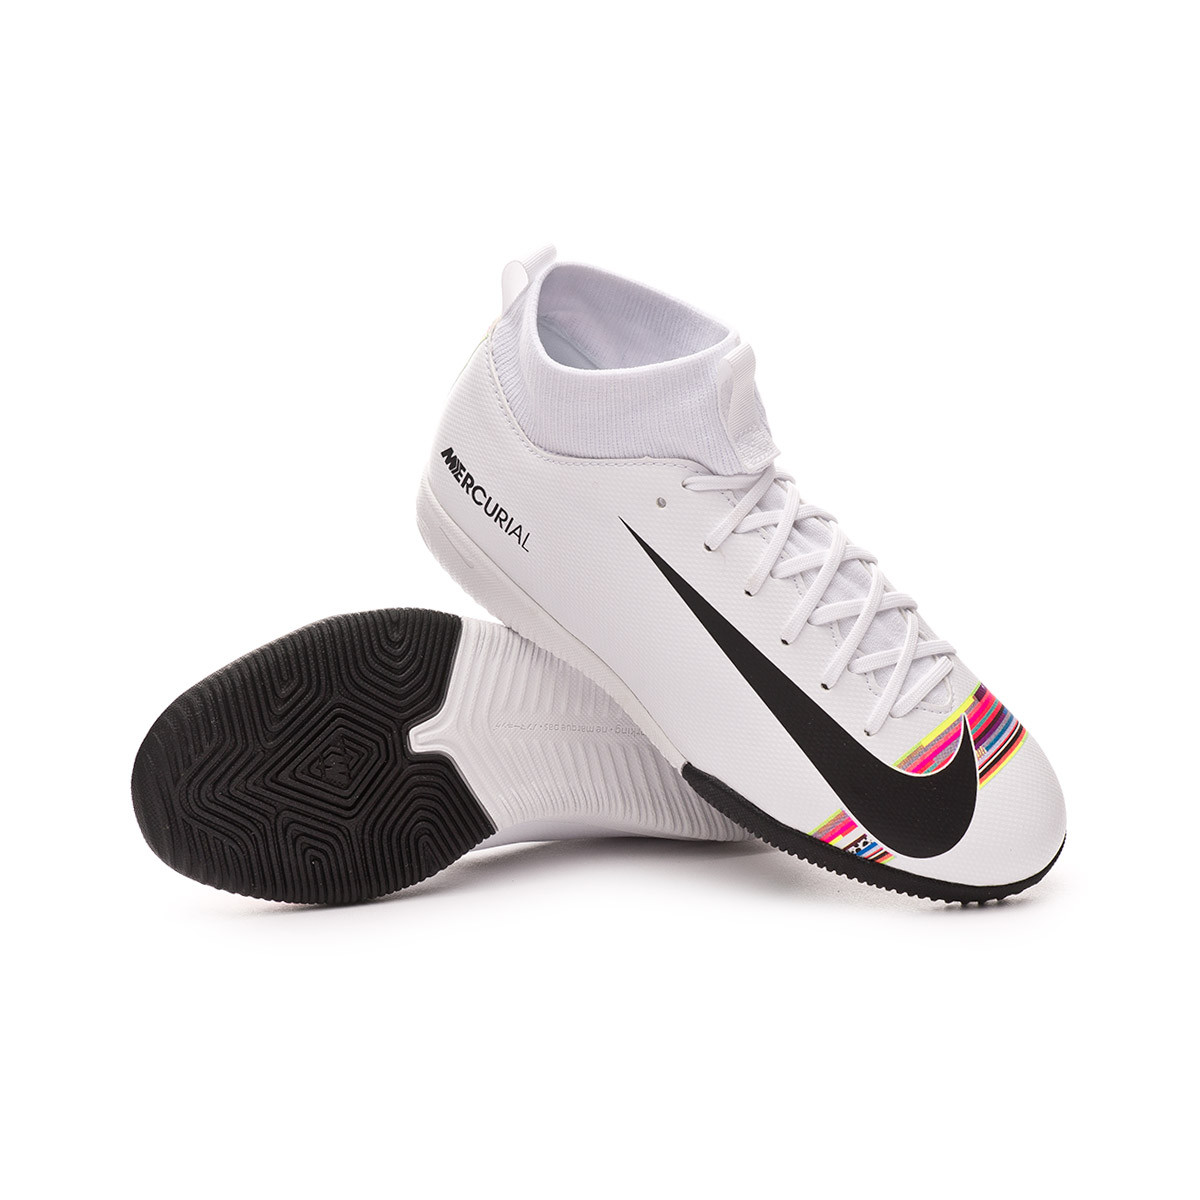 Chaussure de futsal Nike Mercurial SuperflyX VI Academy LVL UP IC Niño